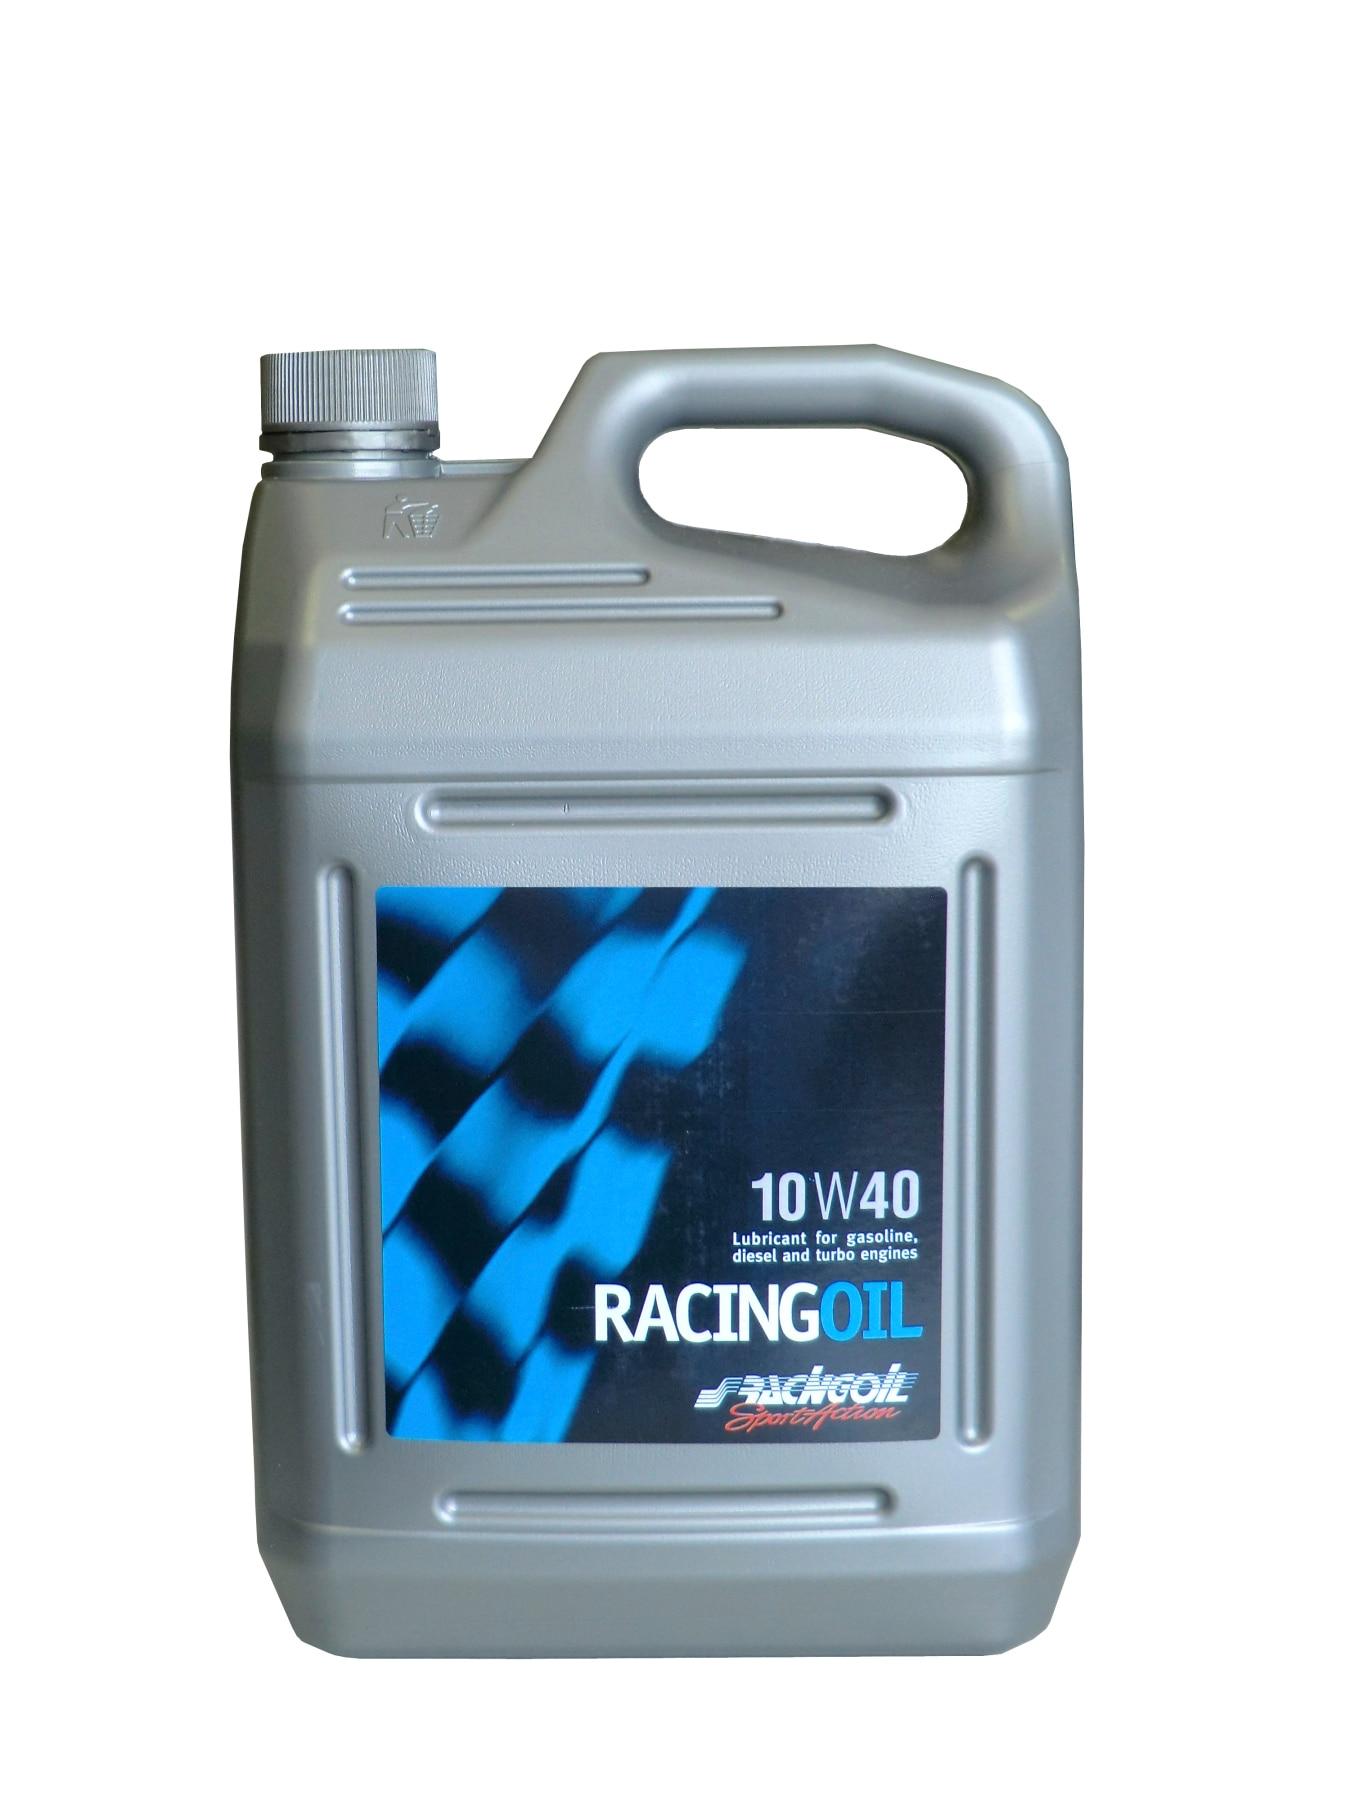 ACEITE RACING OIL 10W40 5 LITROS